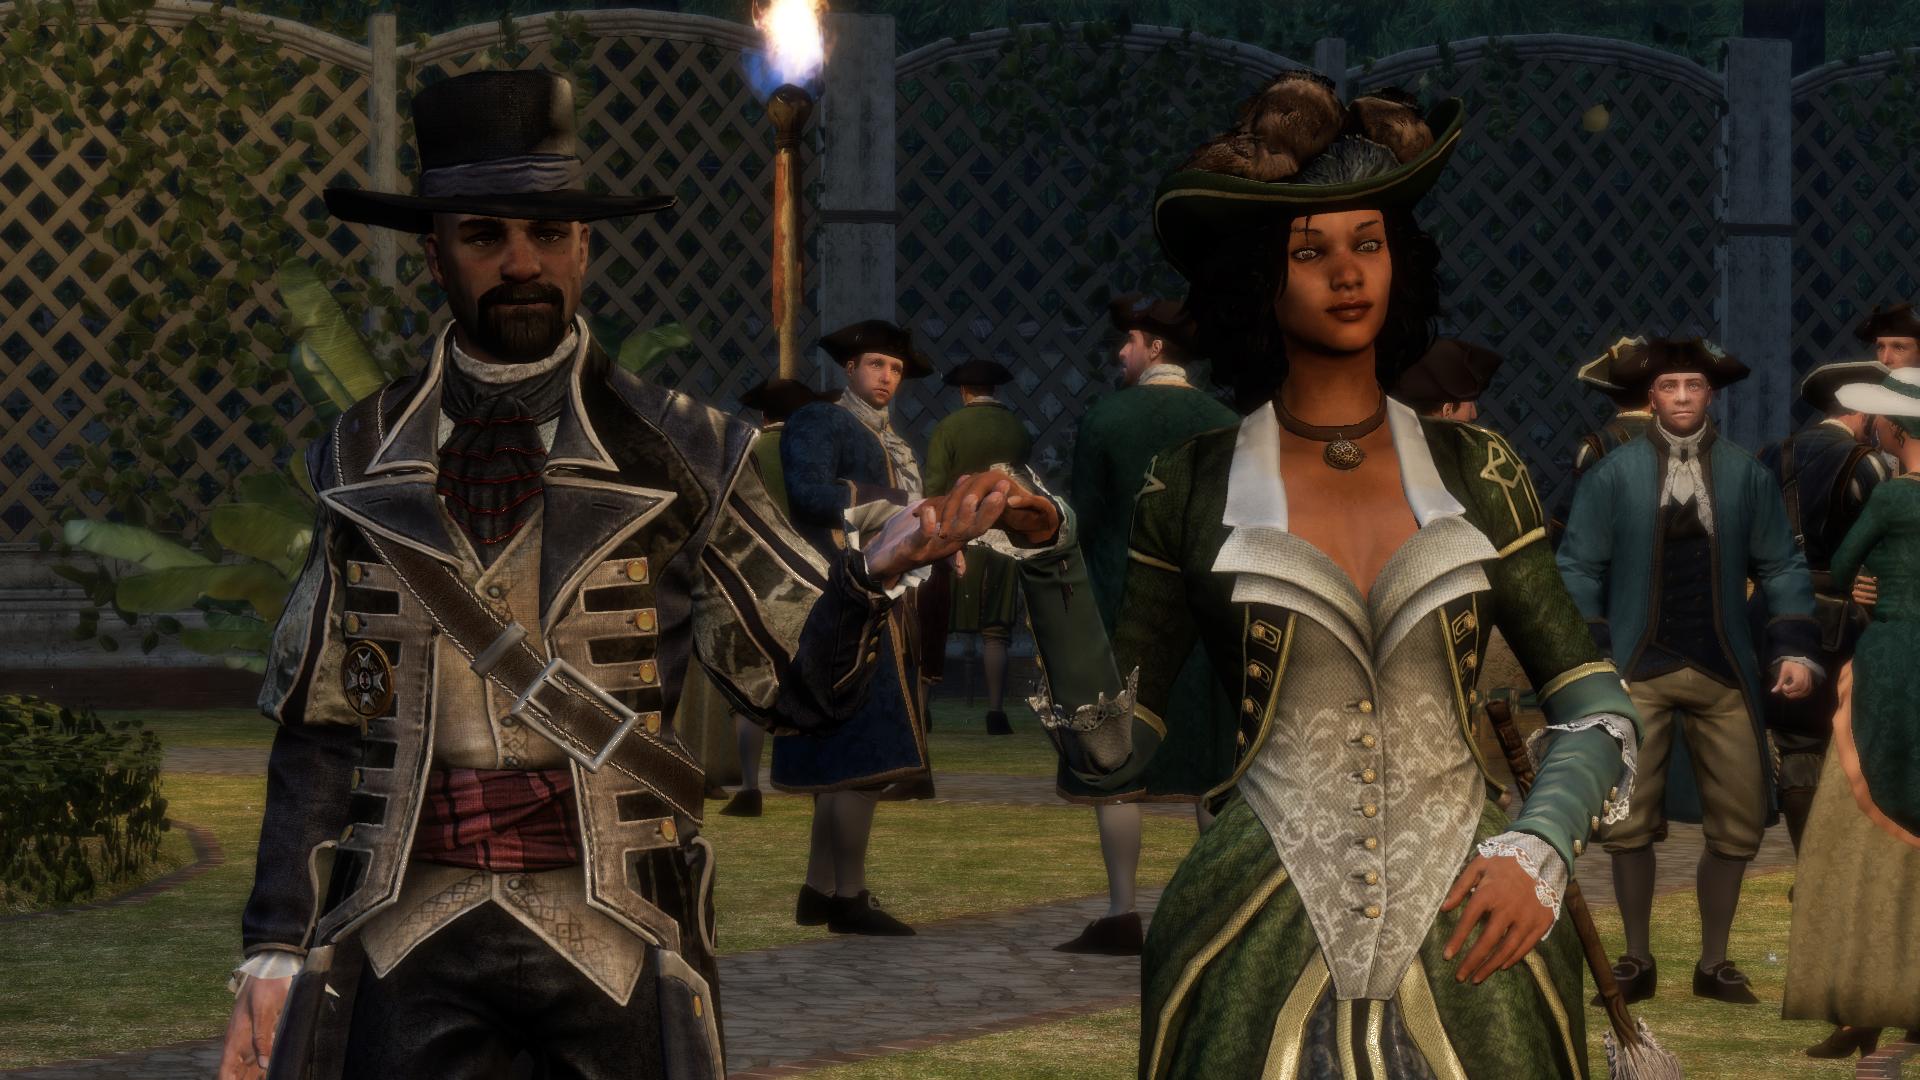 Aveline de Grandpré | Assassin\'s Creed Wiki | FANDOM powered by Wikia